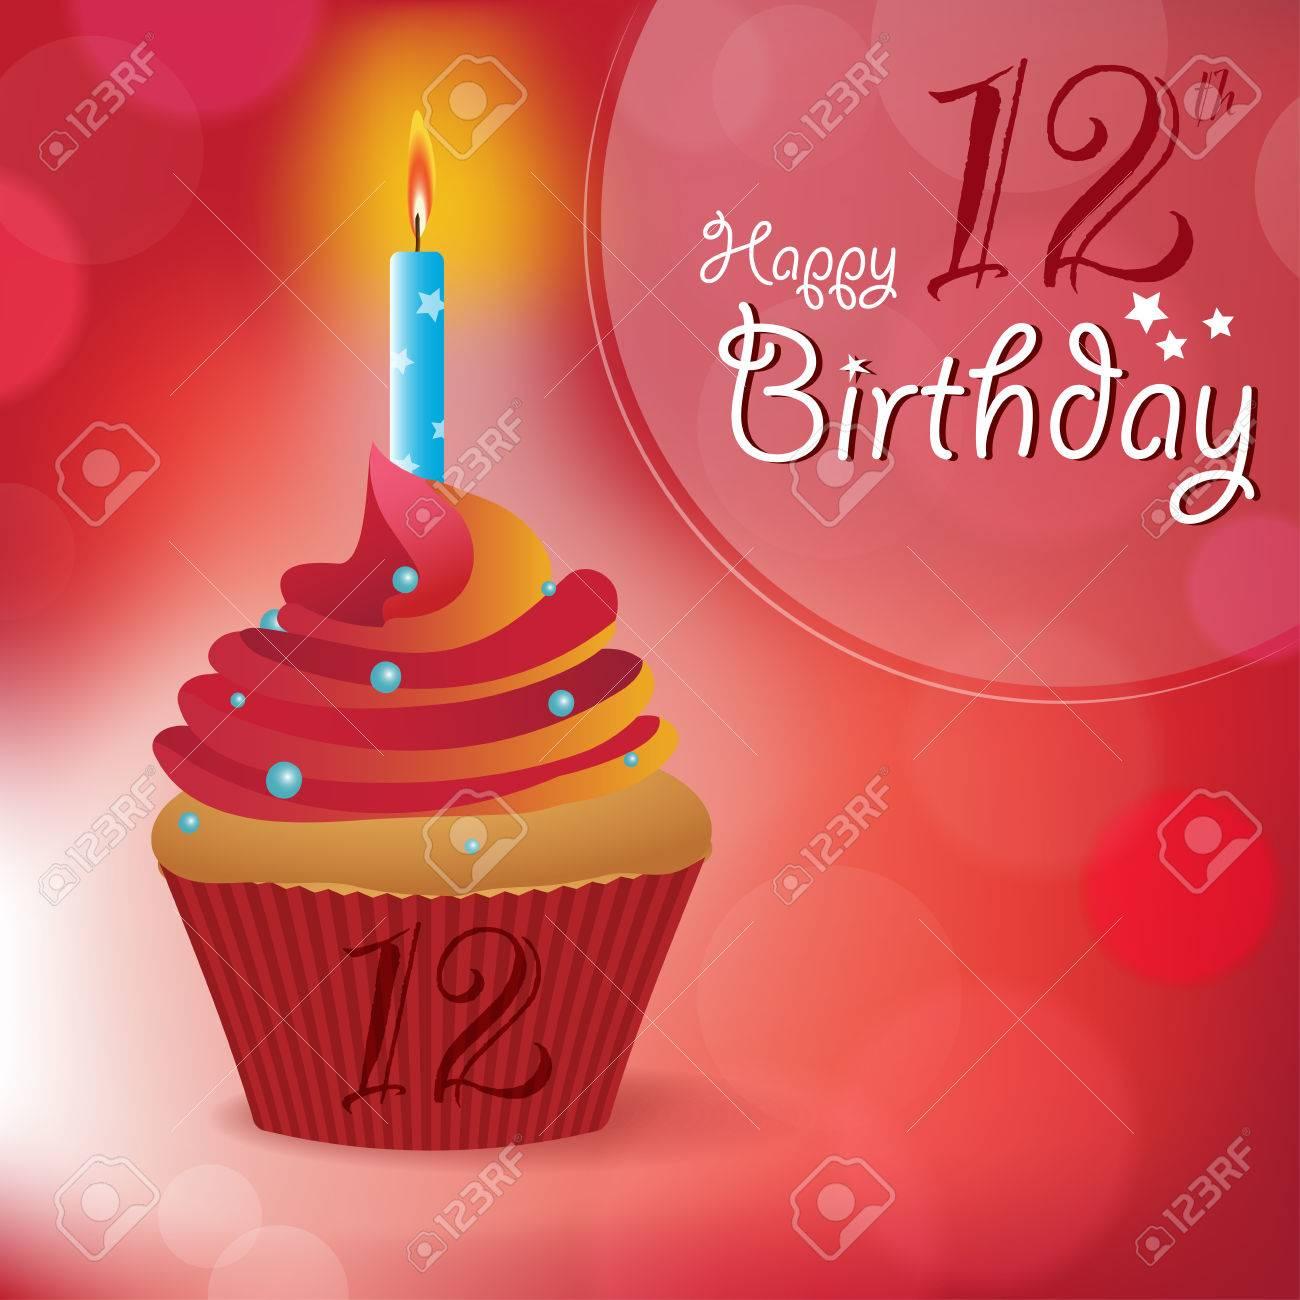 Happy 12th Birthday Greeting Invitation Message